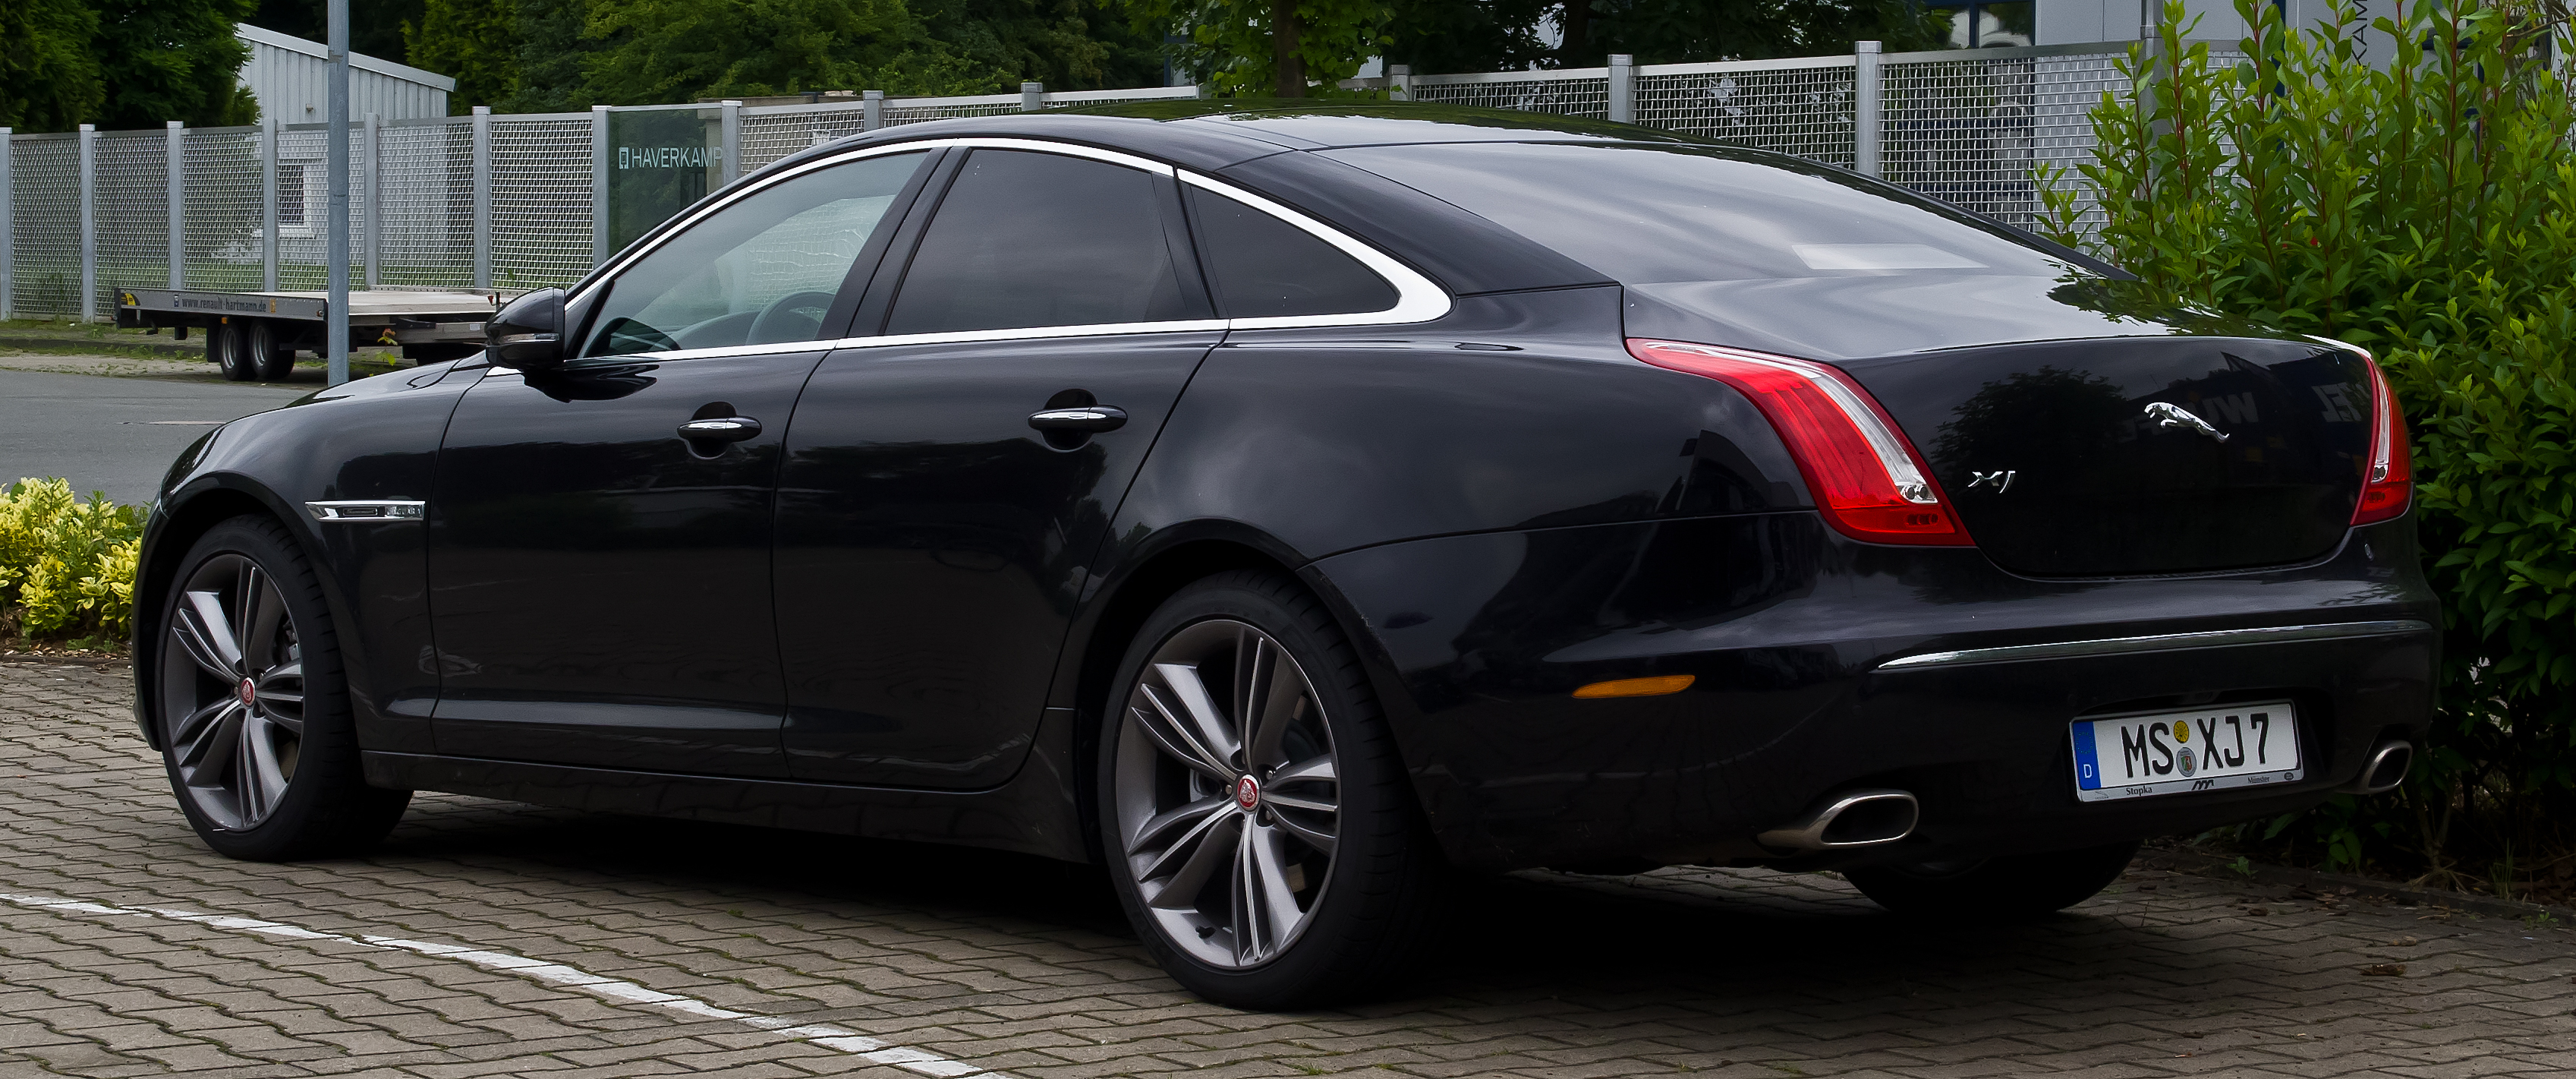 jaguar xj 3.0 diesel review